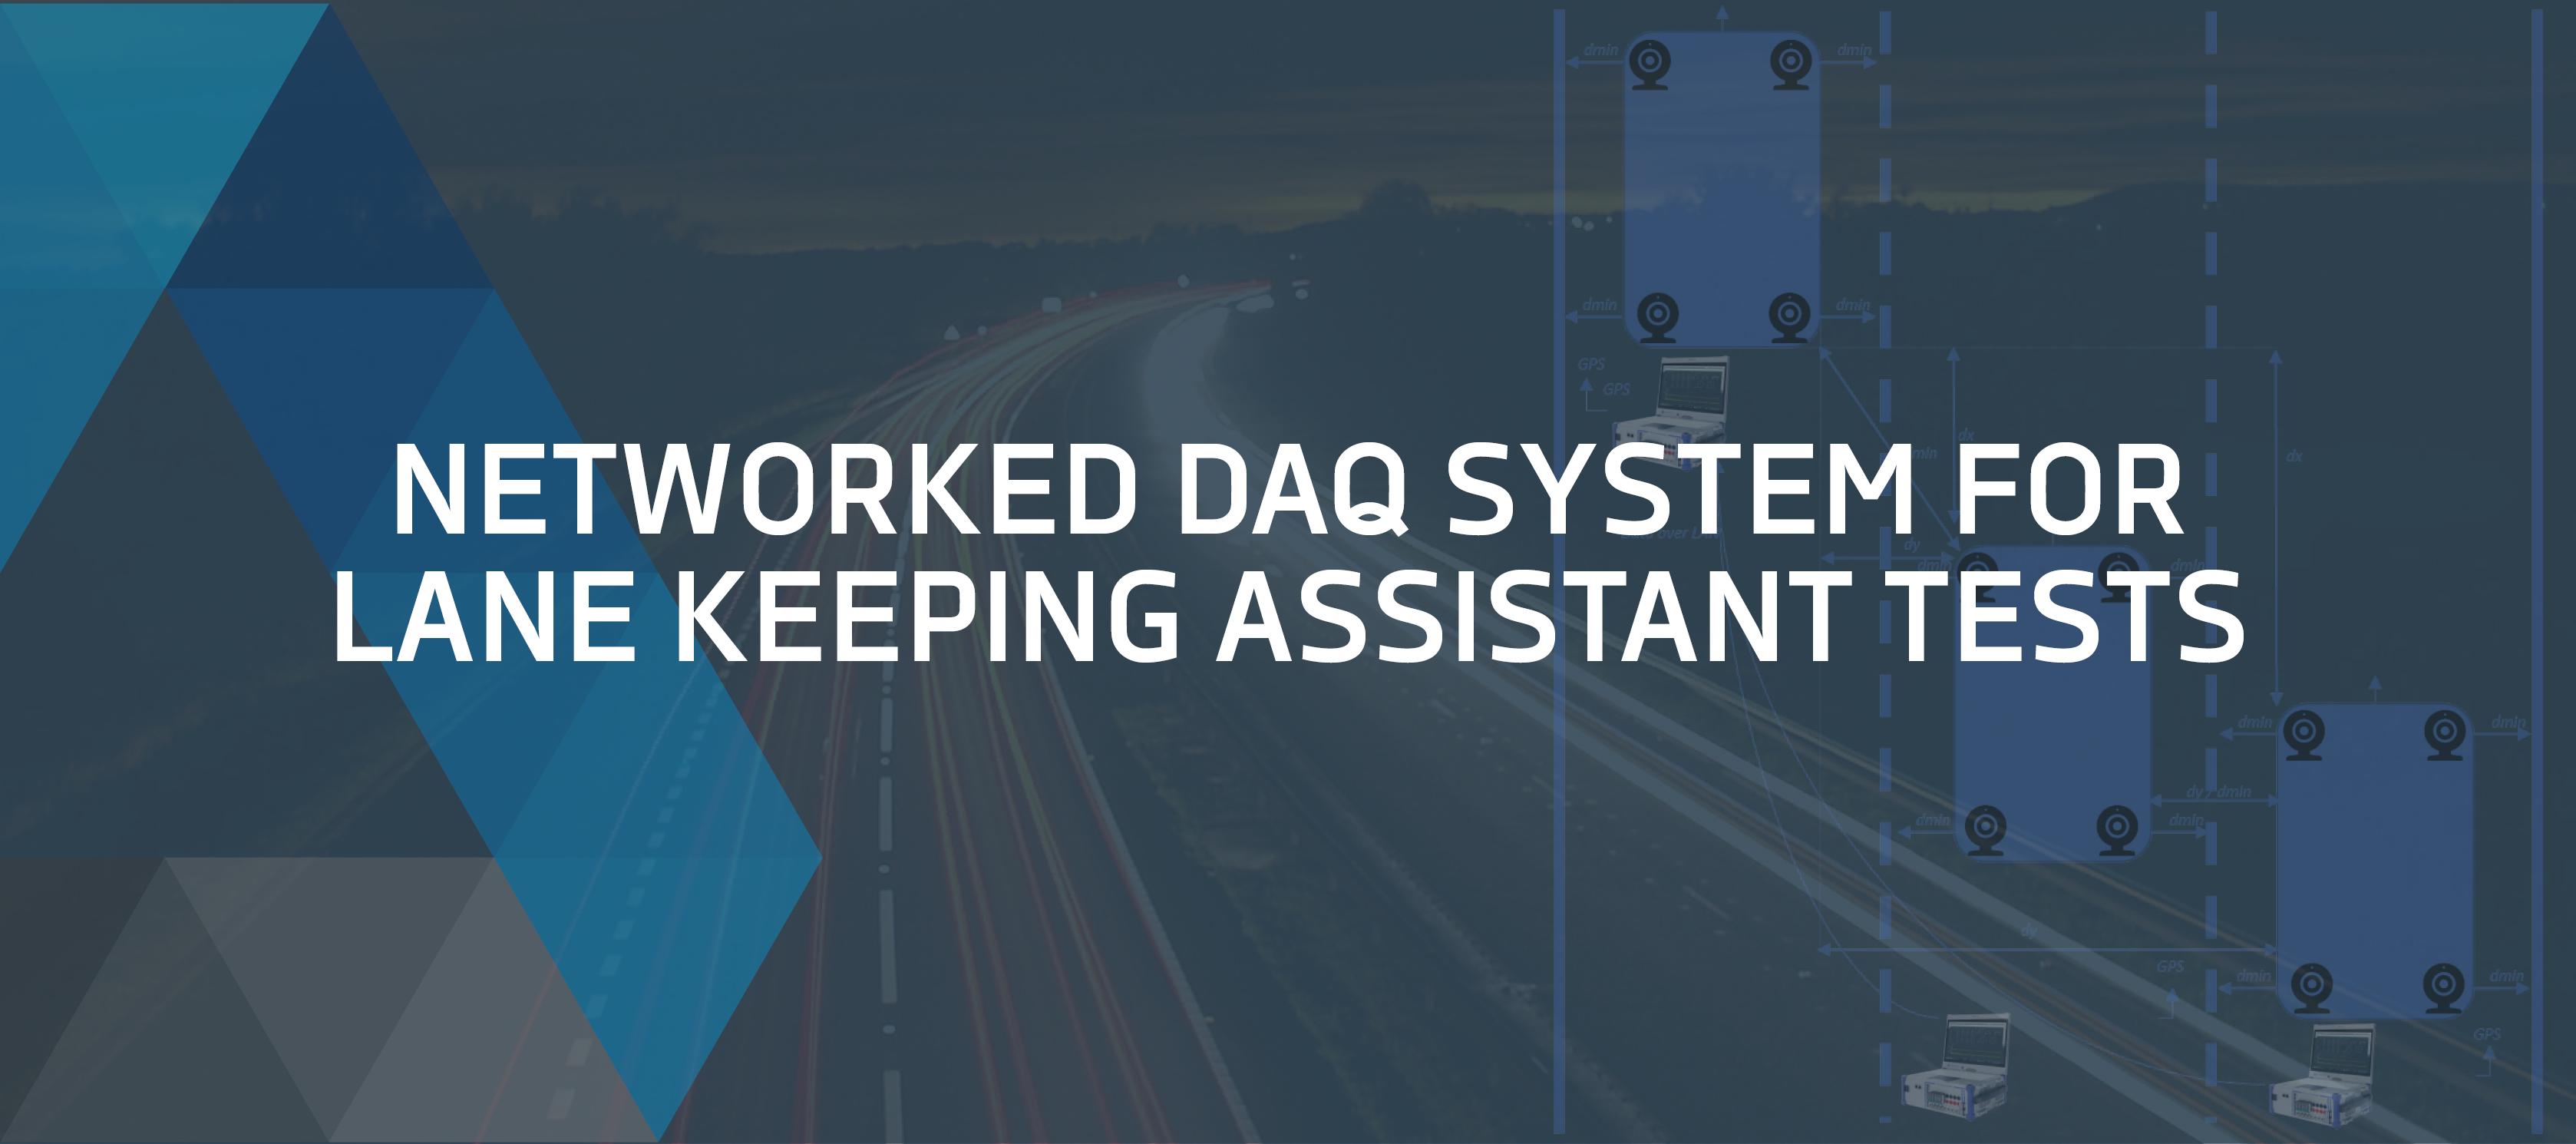 dewetron-solution-ADAS-lane-keeping-assistant-test